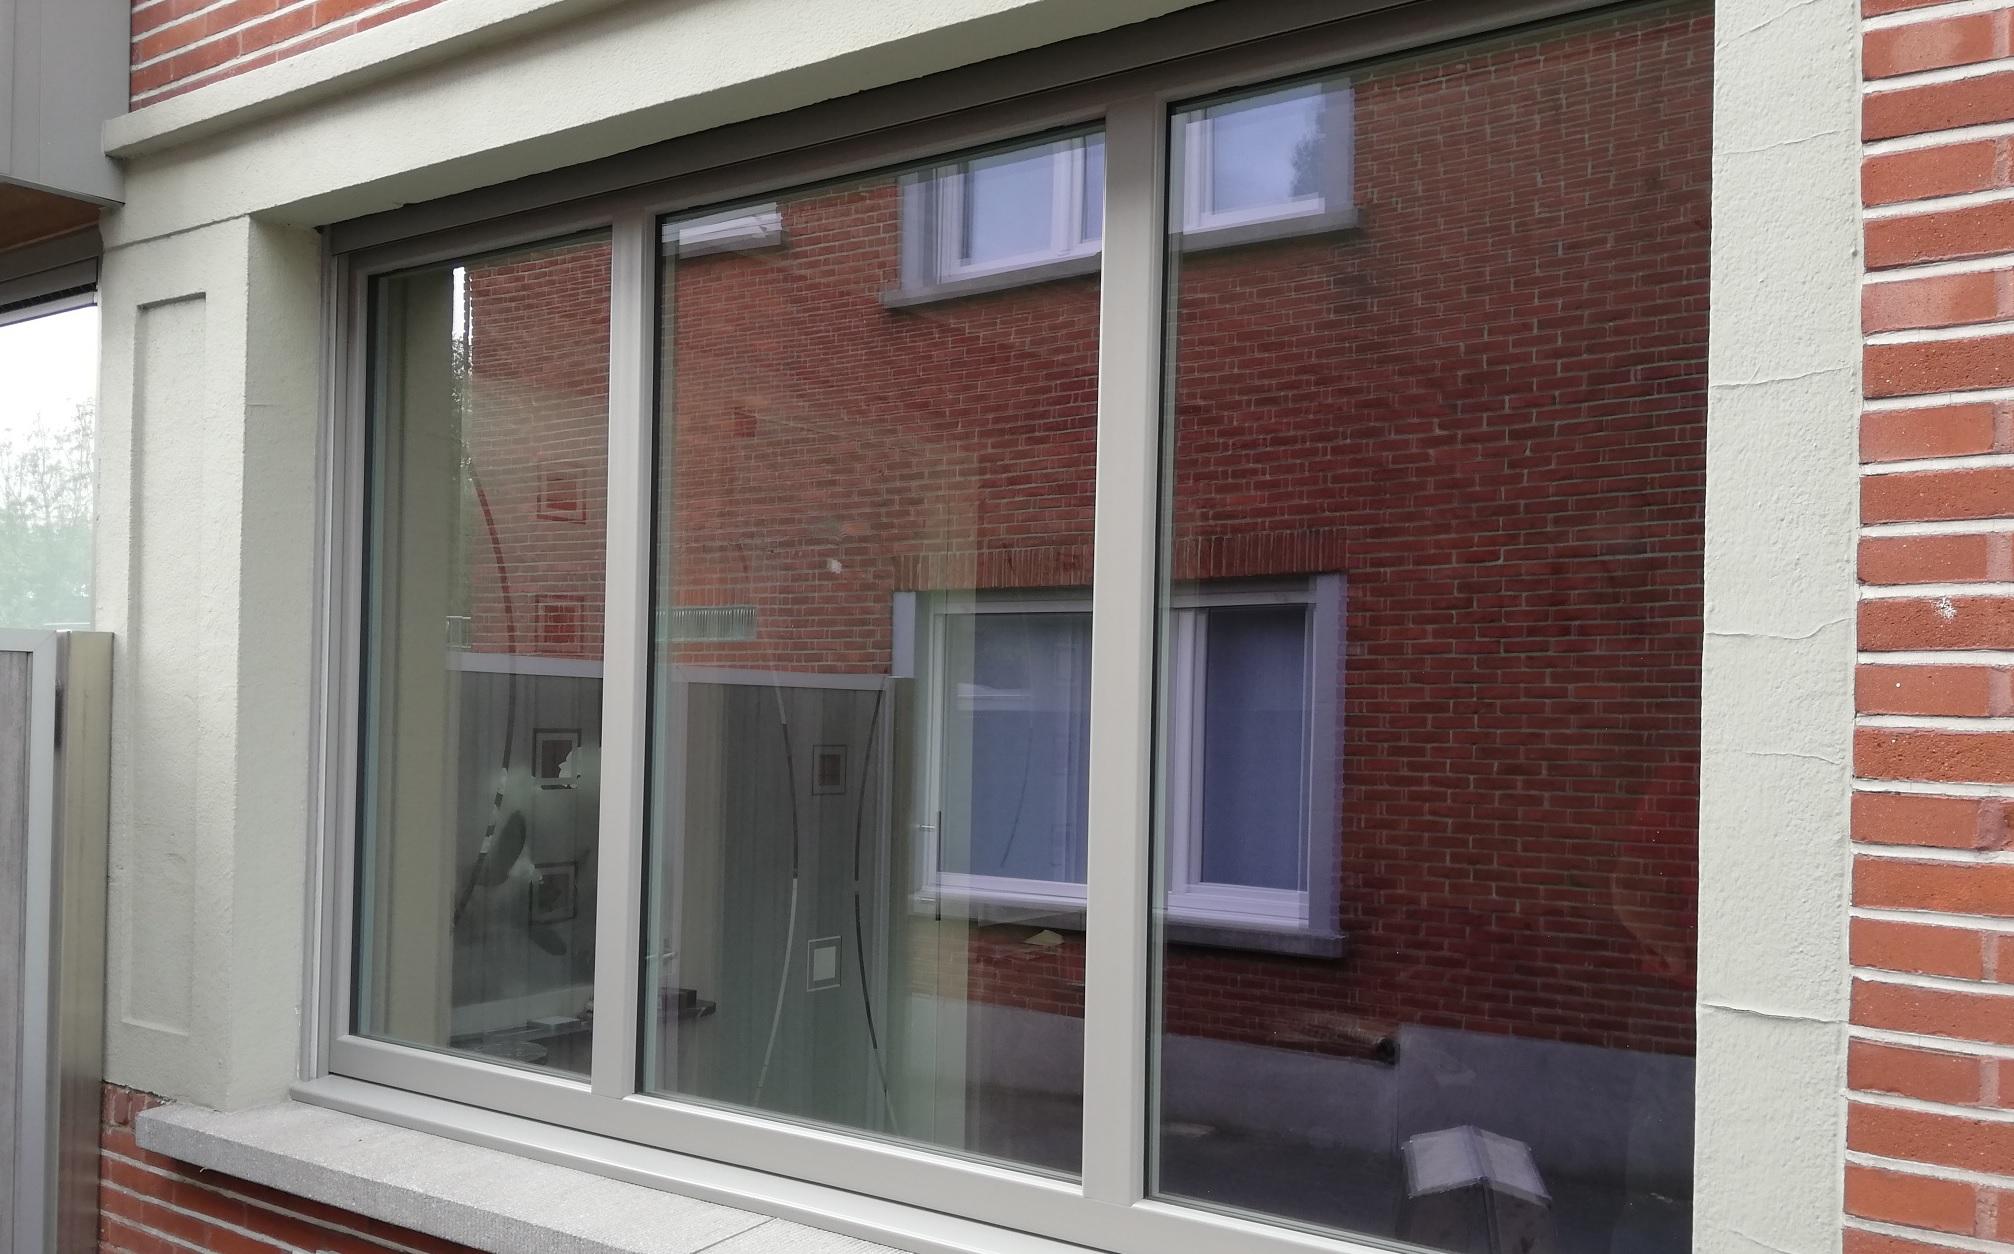 Fenêtres Pvc Haute Isolation Opsomer Delmotte